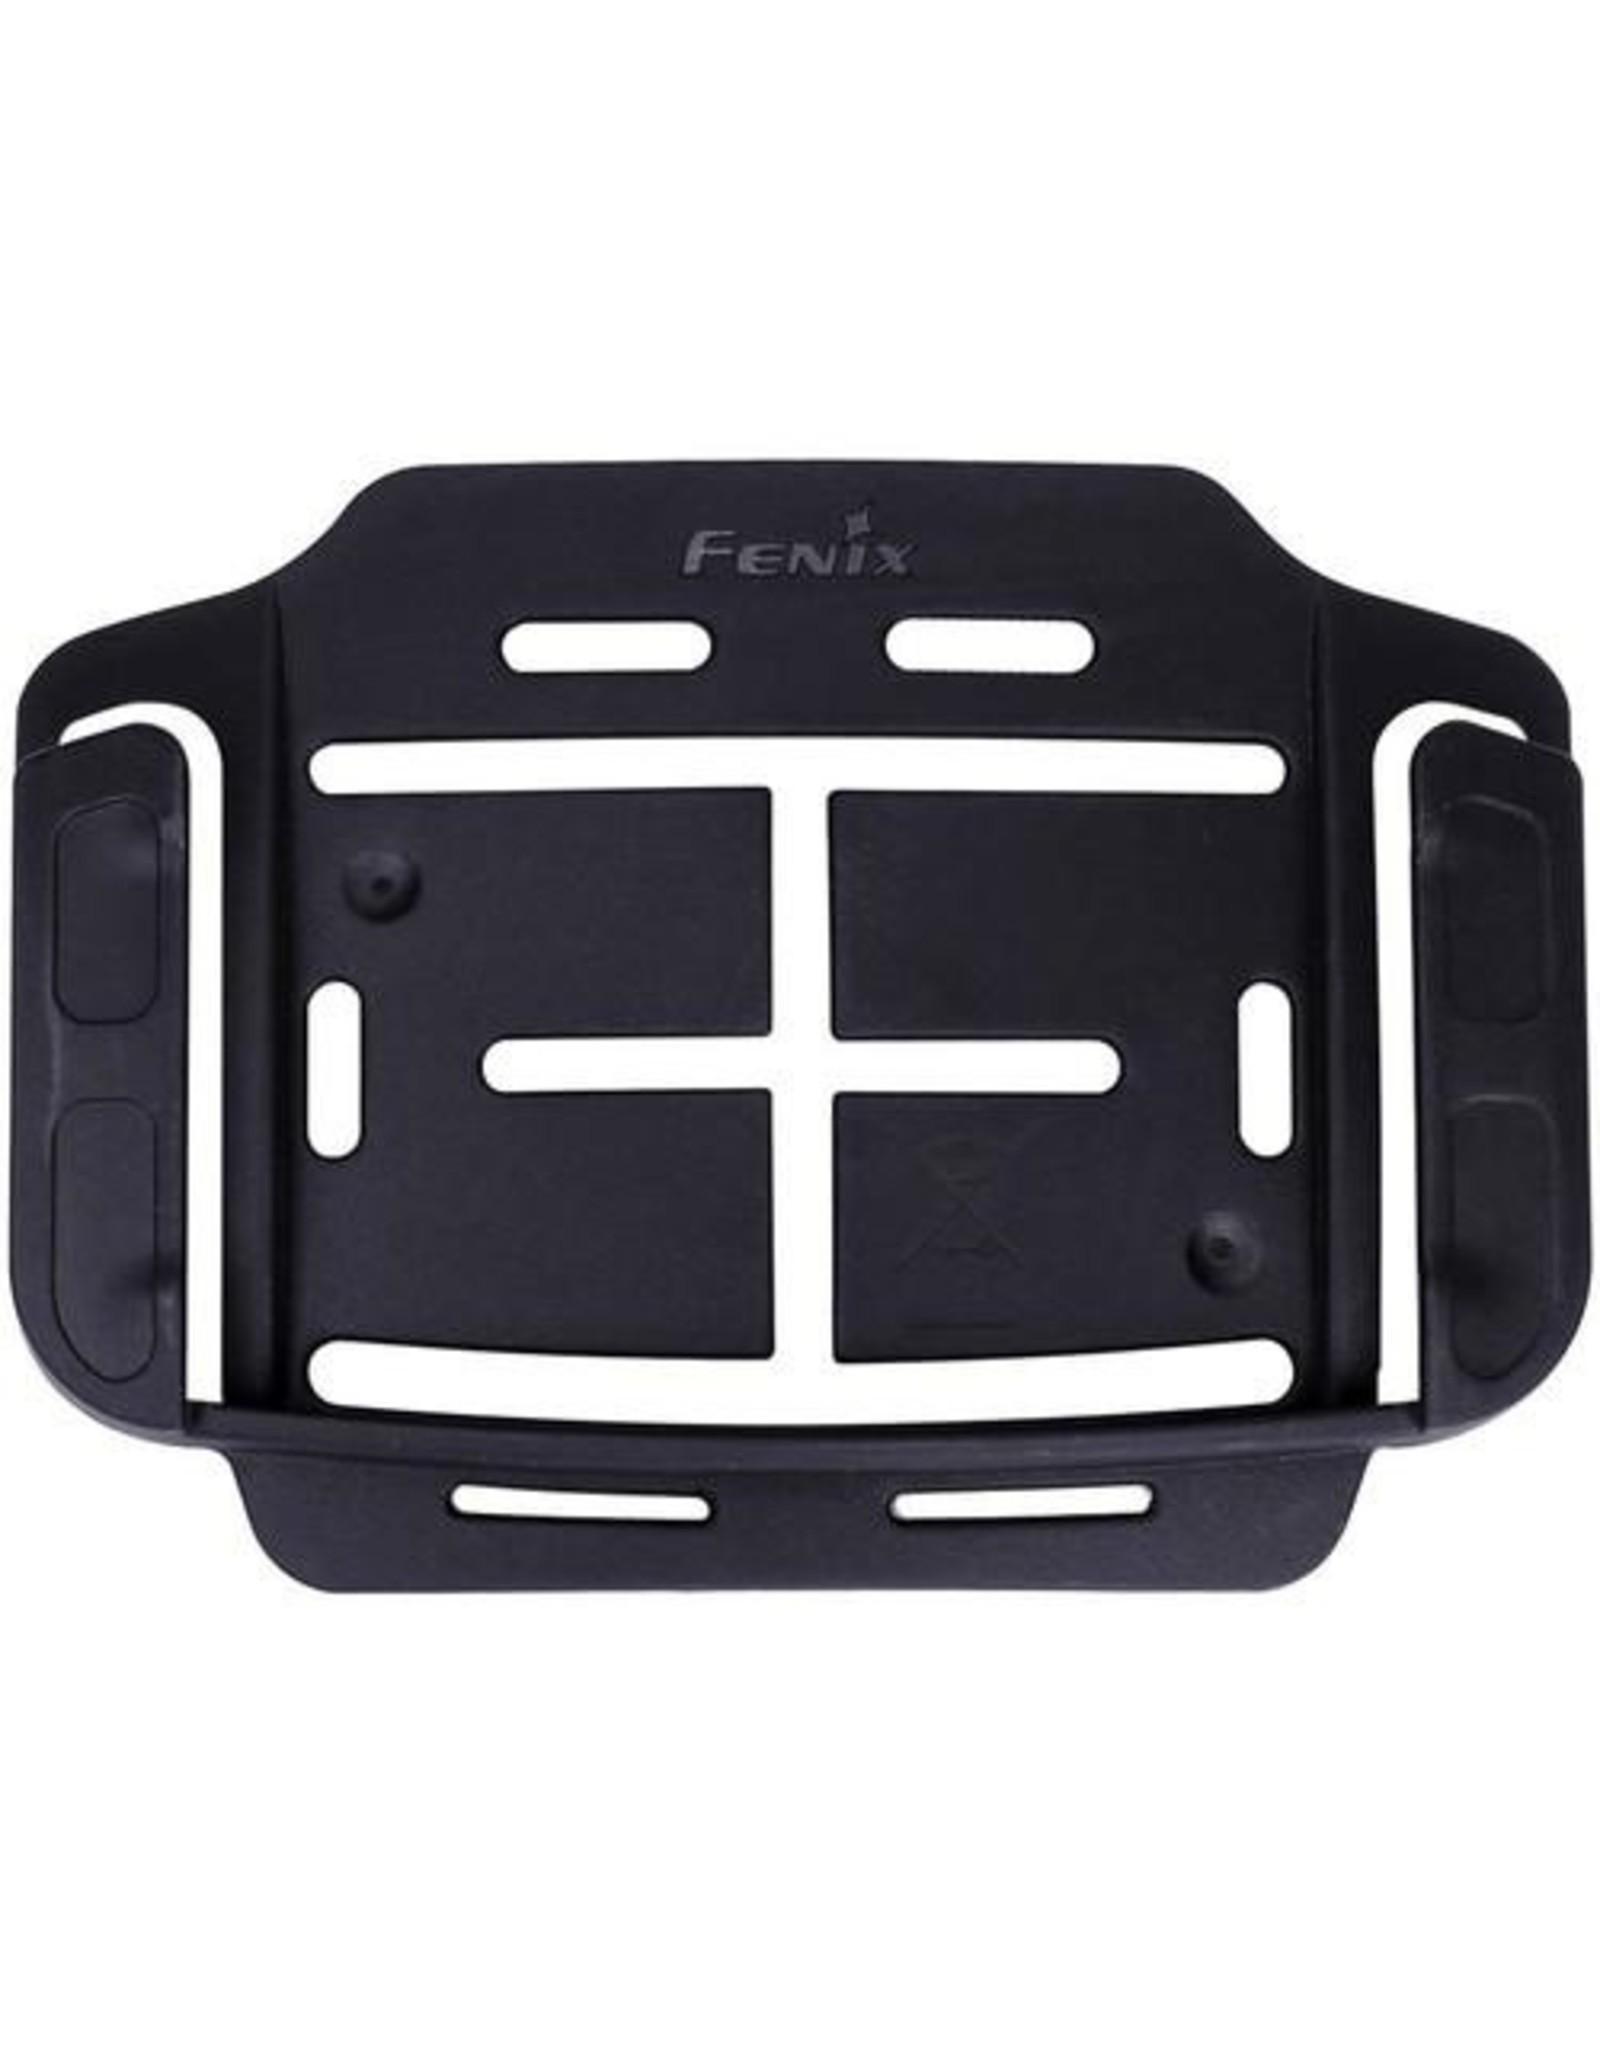 Fenix - ALG-03 V2.0 Helmet Mount